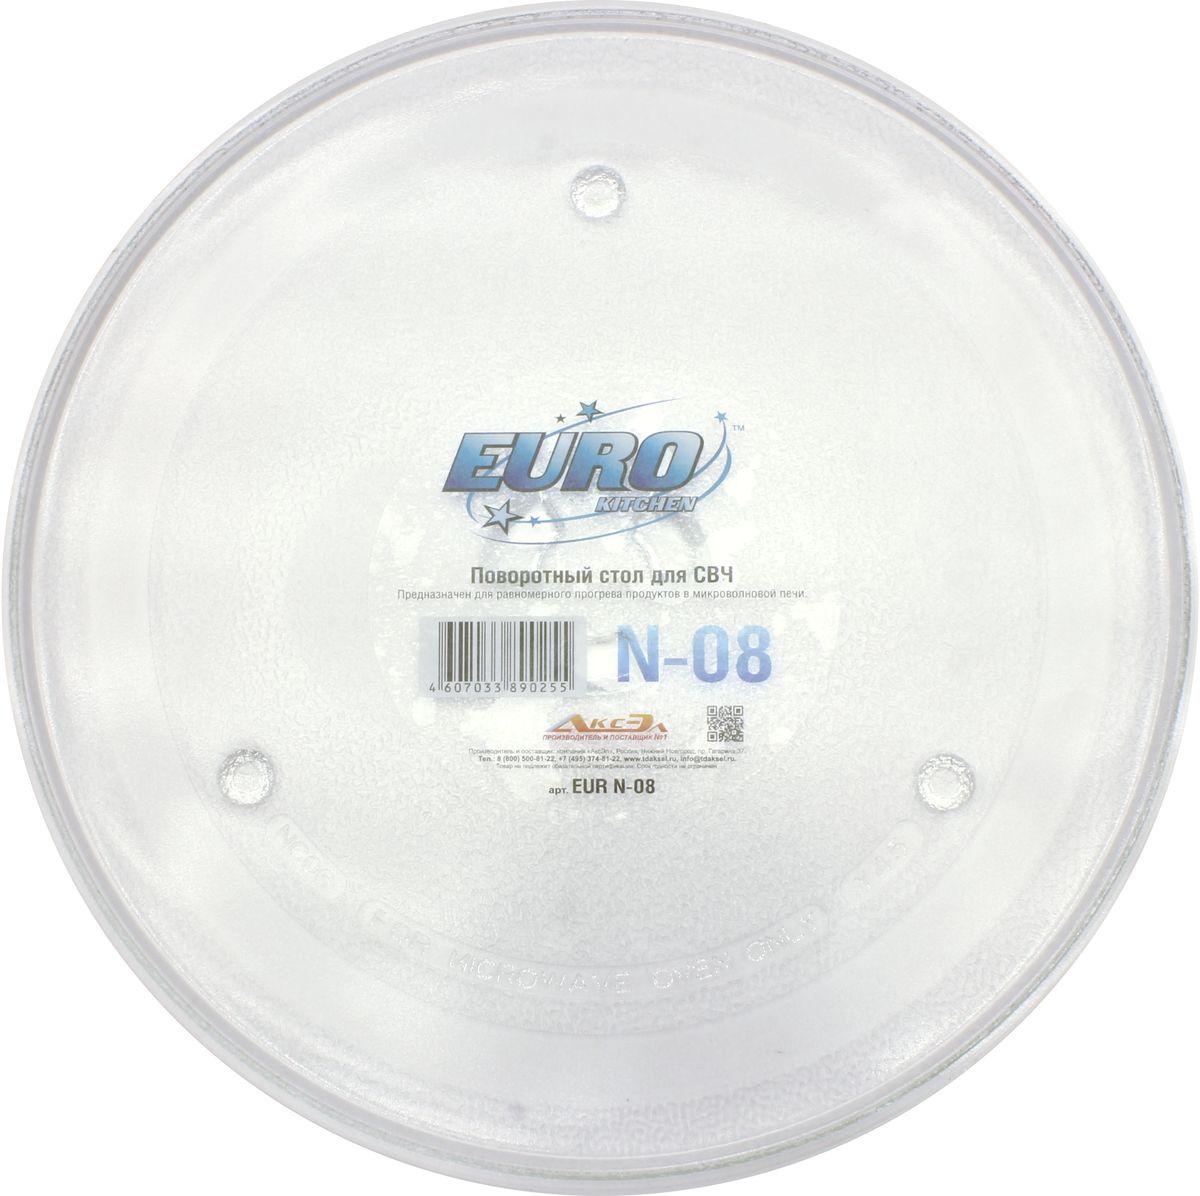 купить Euro Kitchen N-08 тарелка для СВЧ